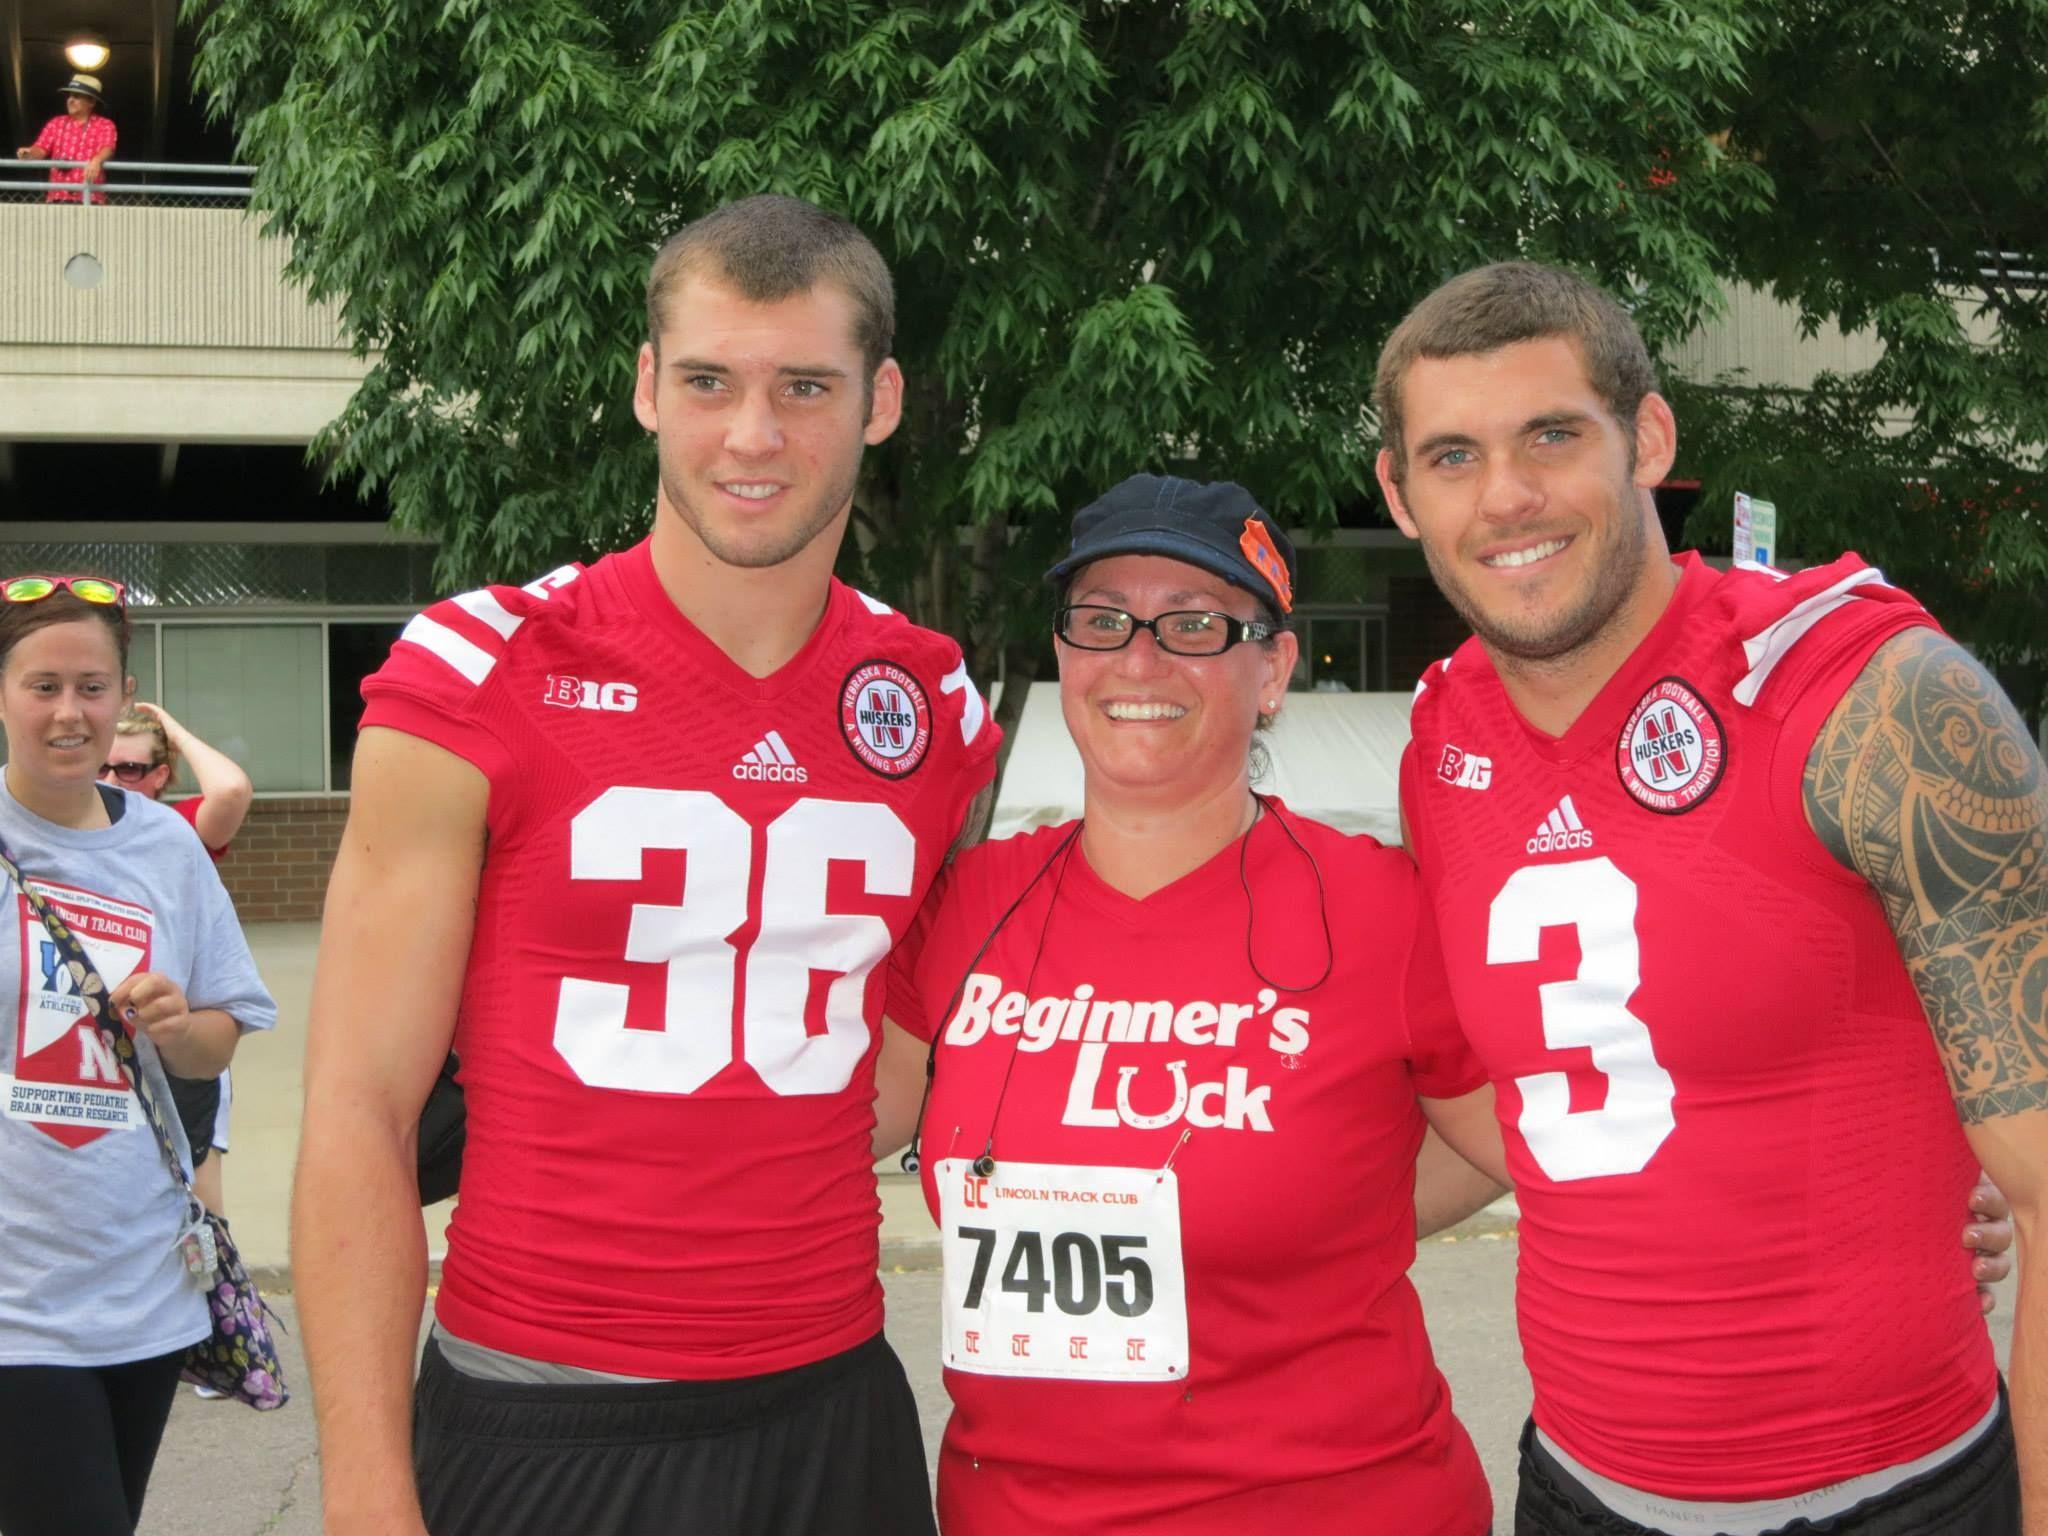 Drake Martinez And Taylor Martinez At Uplifting Athletes Fun Run July 2013 Fun Run Athlete Husker